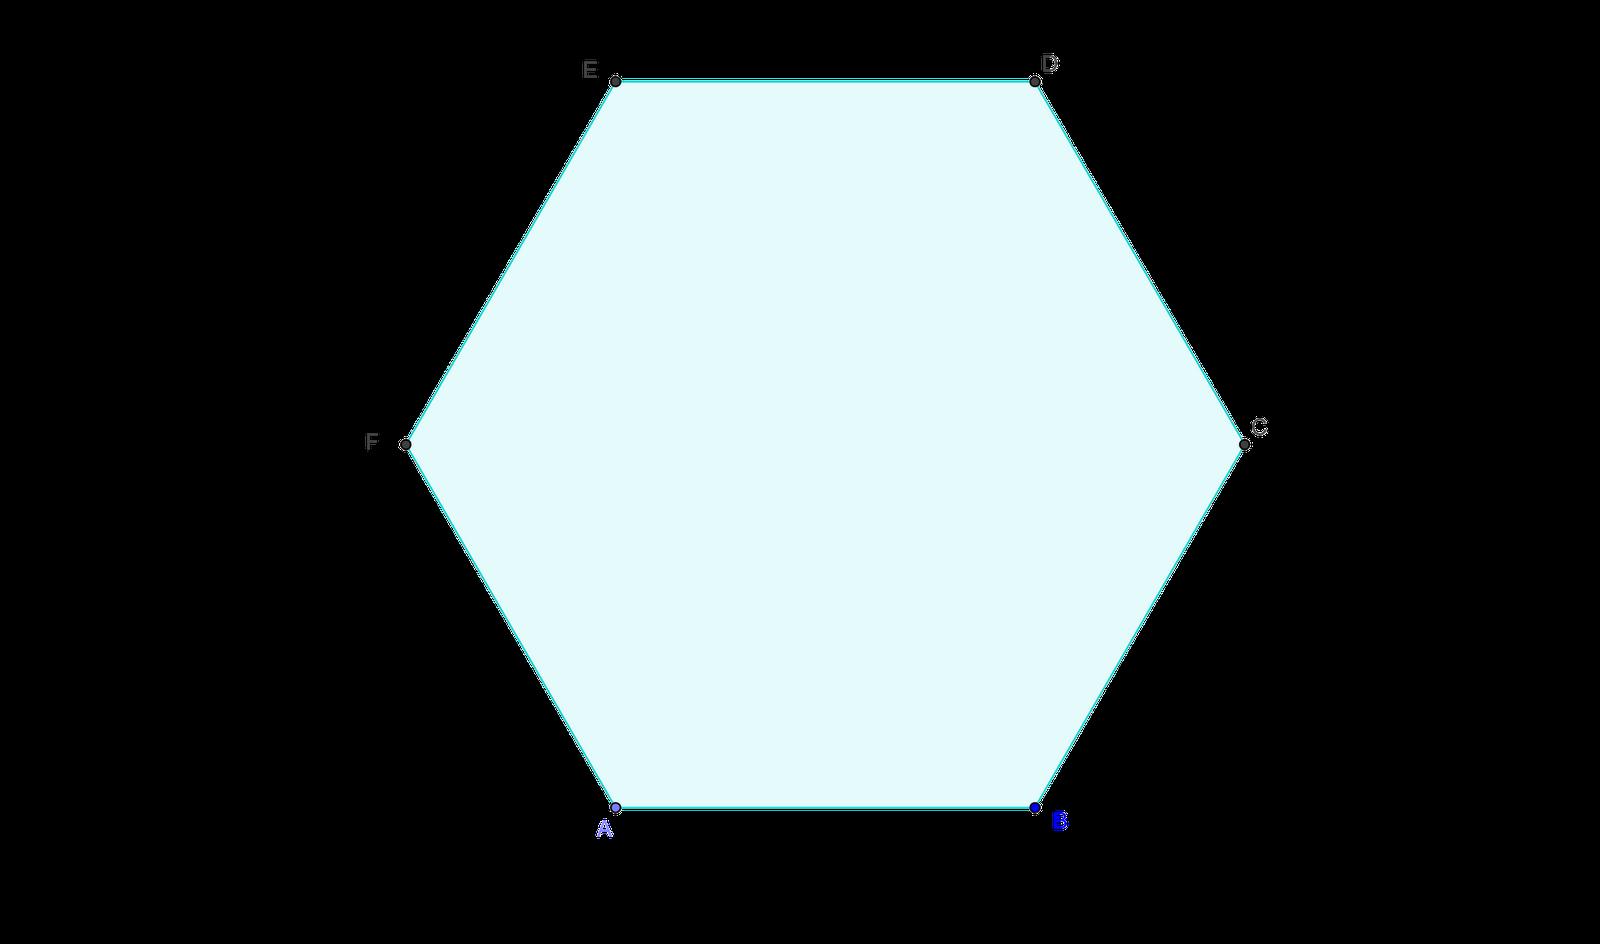 Perimetro de un paralelogramo ejemplo